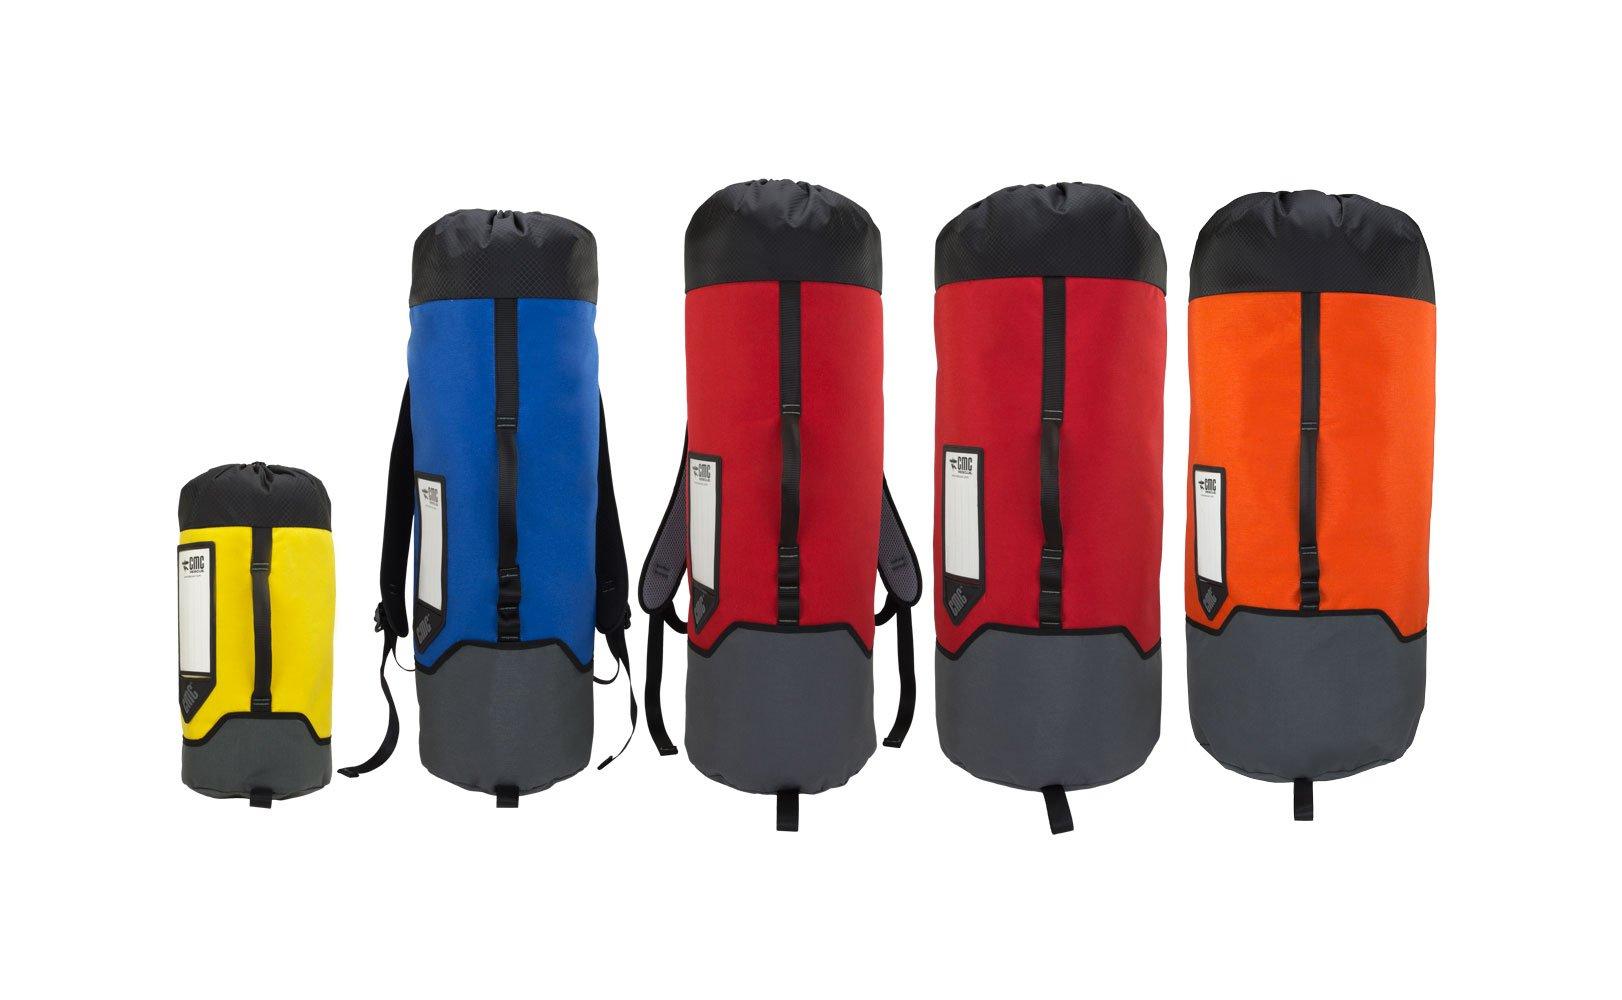 CMC Rescue 430403 Rope Bags Model #4 - 2600 ci (43 L) Red